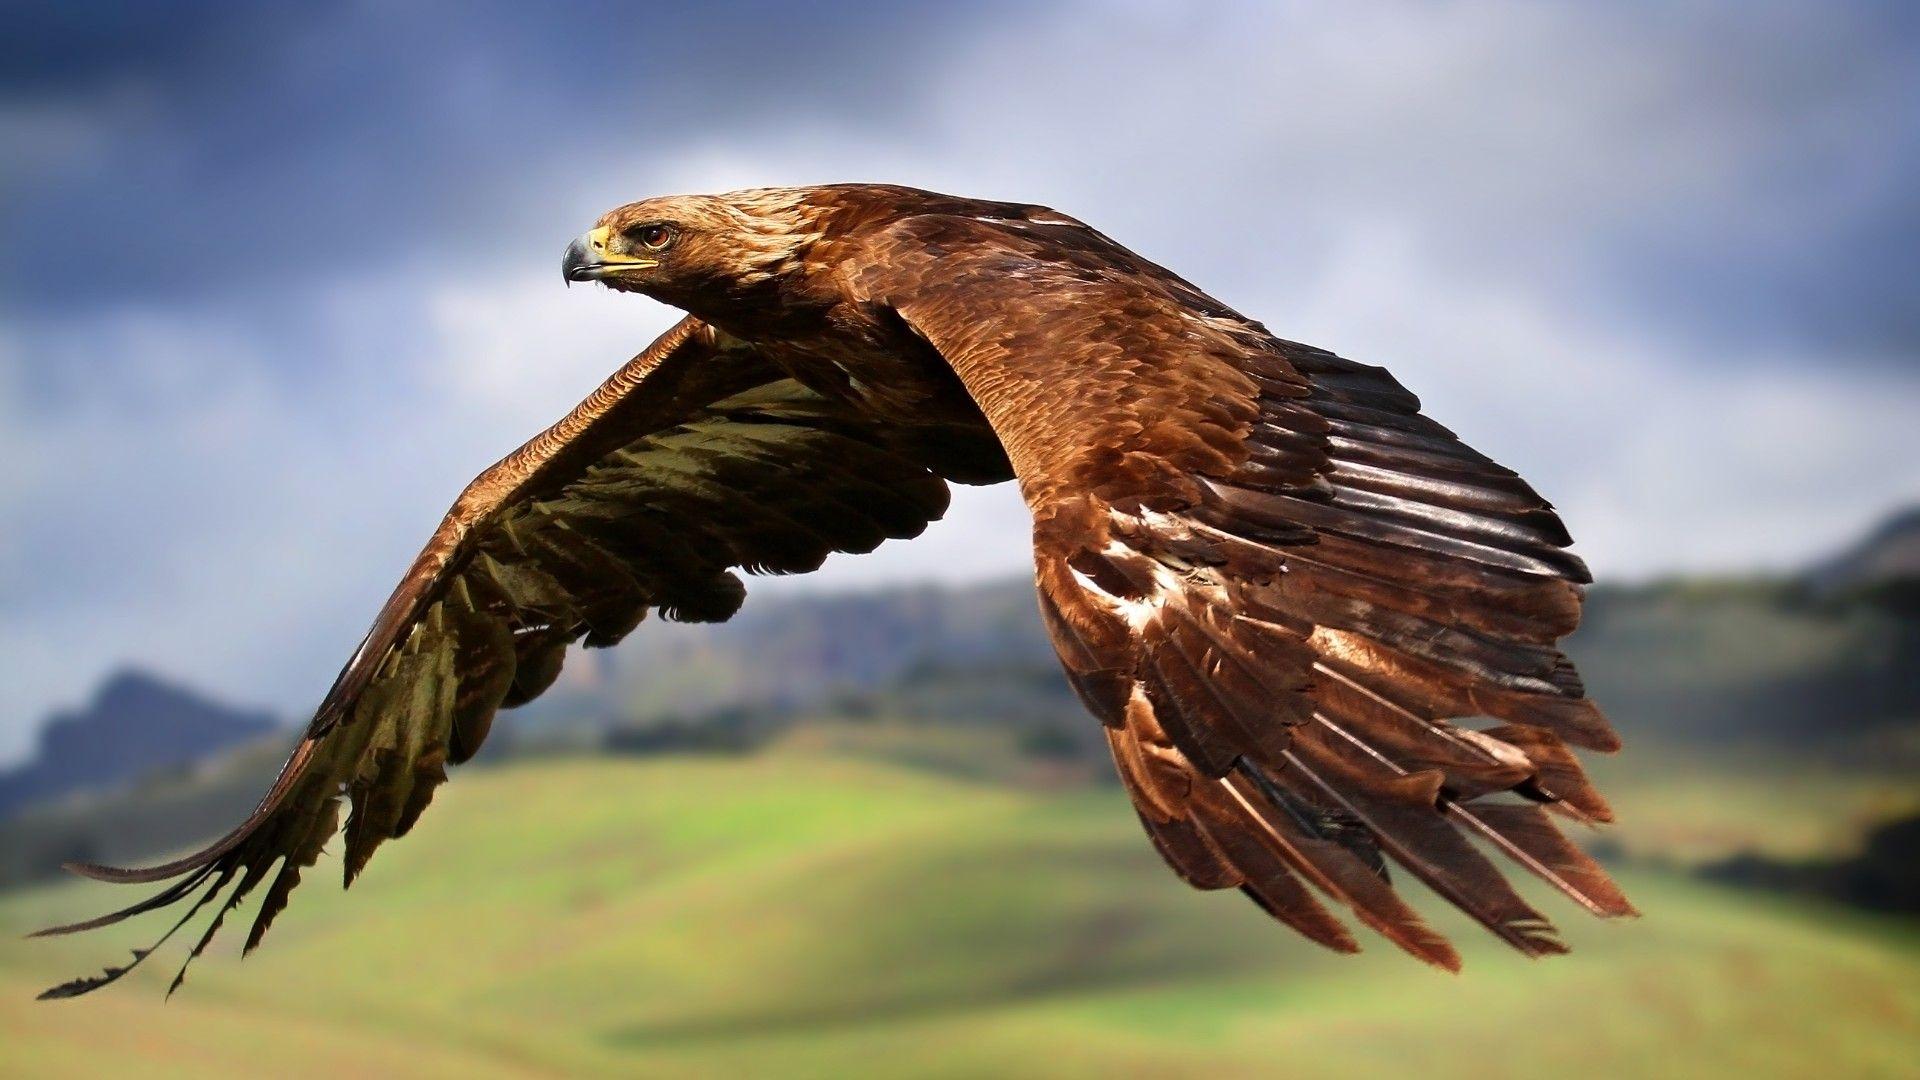 Bald Eagle 8k Close Up Bird Of Prey 8k Uhd Bird Eagle Wildlife Beak Photography 8k Wallpaper Hdwallpaper Eagle Wallpaper Bald Eagle Animal Wallpaper